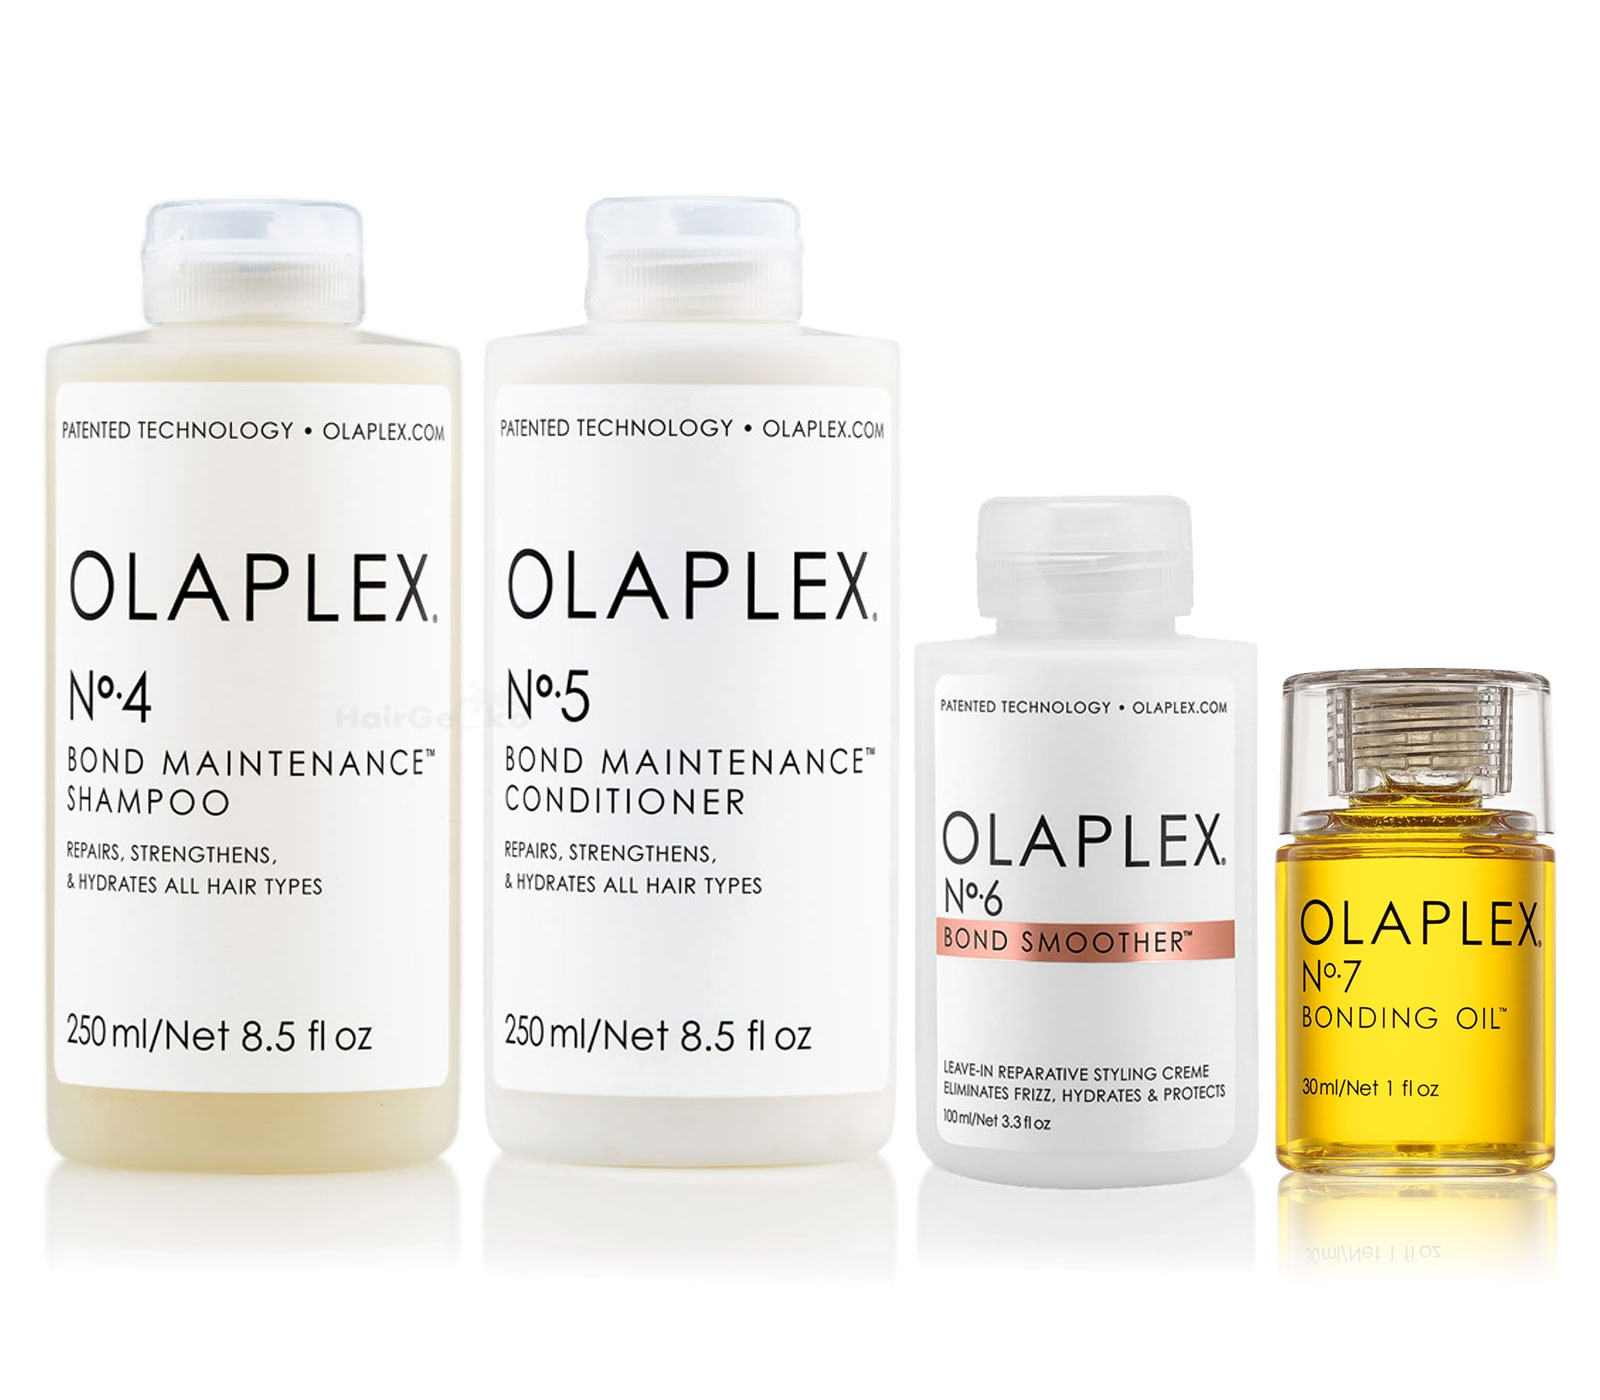 Olaplex Set - Olaplex Bond Maintenance Shampoo No 4 (250ml) + Olaplex Bond Maintenance Conditioner No 5 (250ml) + Olaplex Bond Smoother No 6 (100ml) + Olaplex Bonding Oil No 7 (30ml)